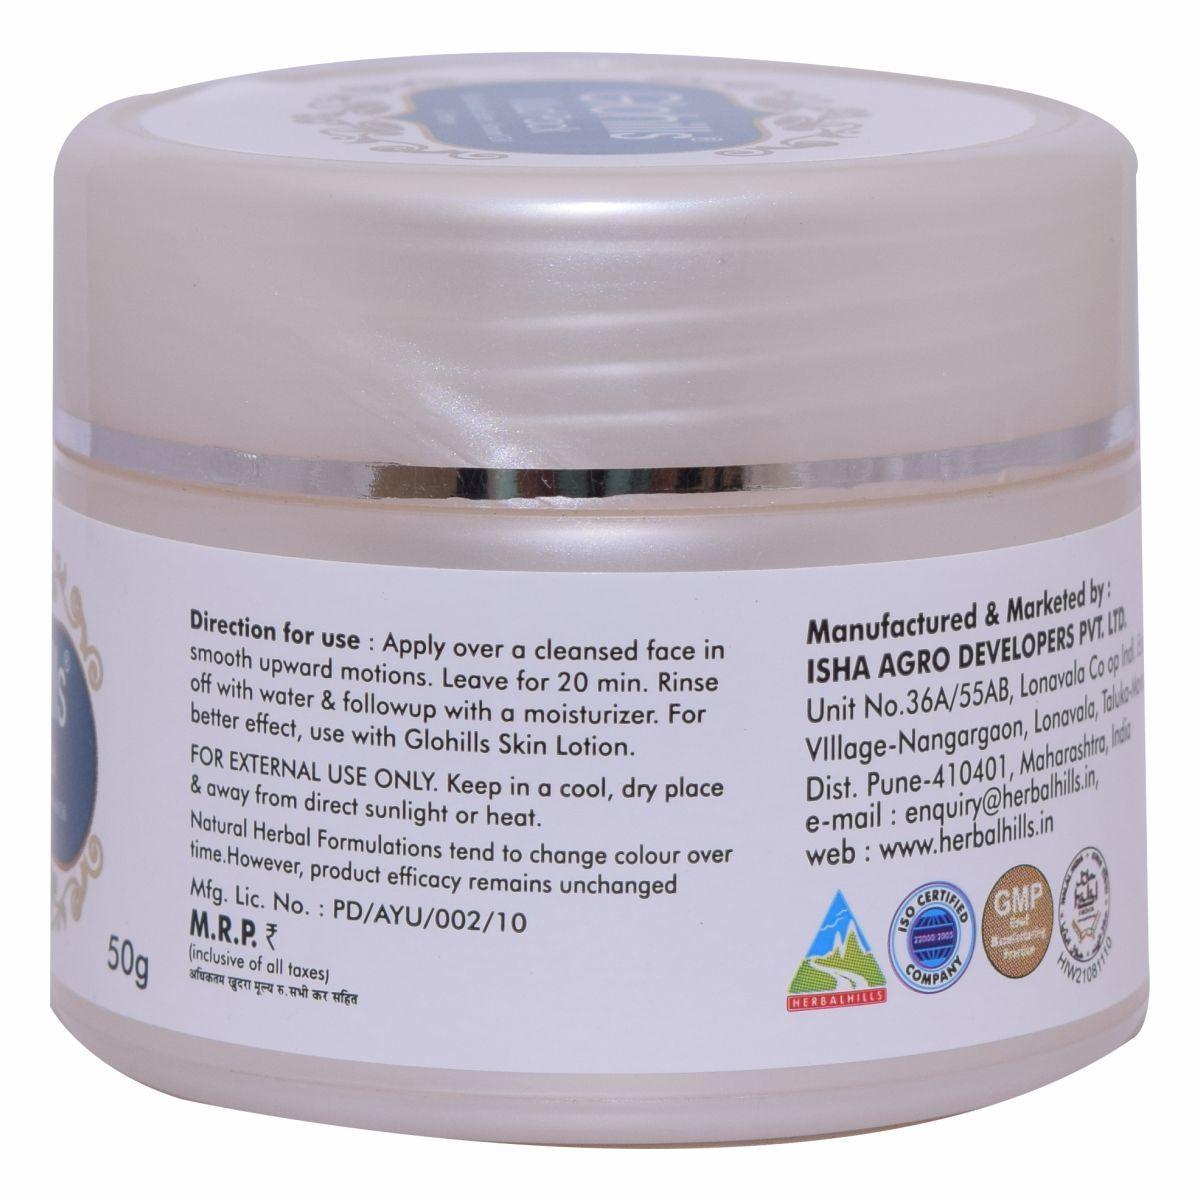 Herbal Skin Care Product Mud Pack